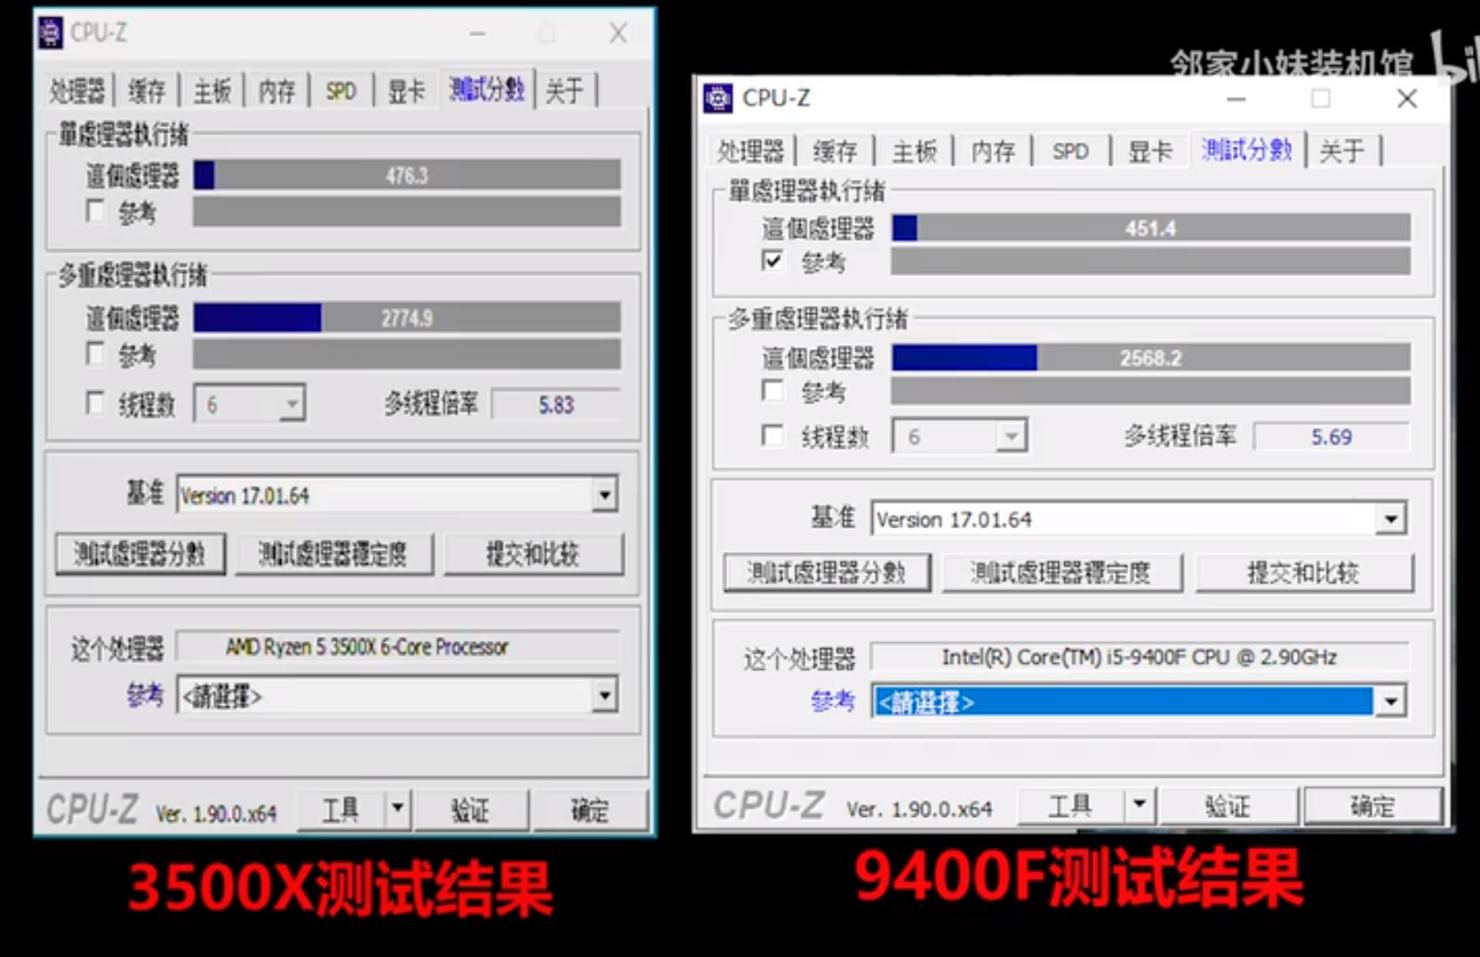 amd-ryzen-5-3500x-cpu-z-benchmark